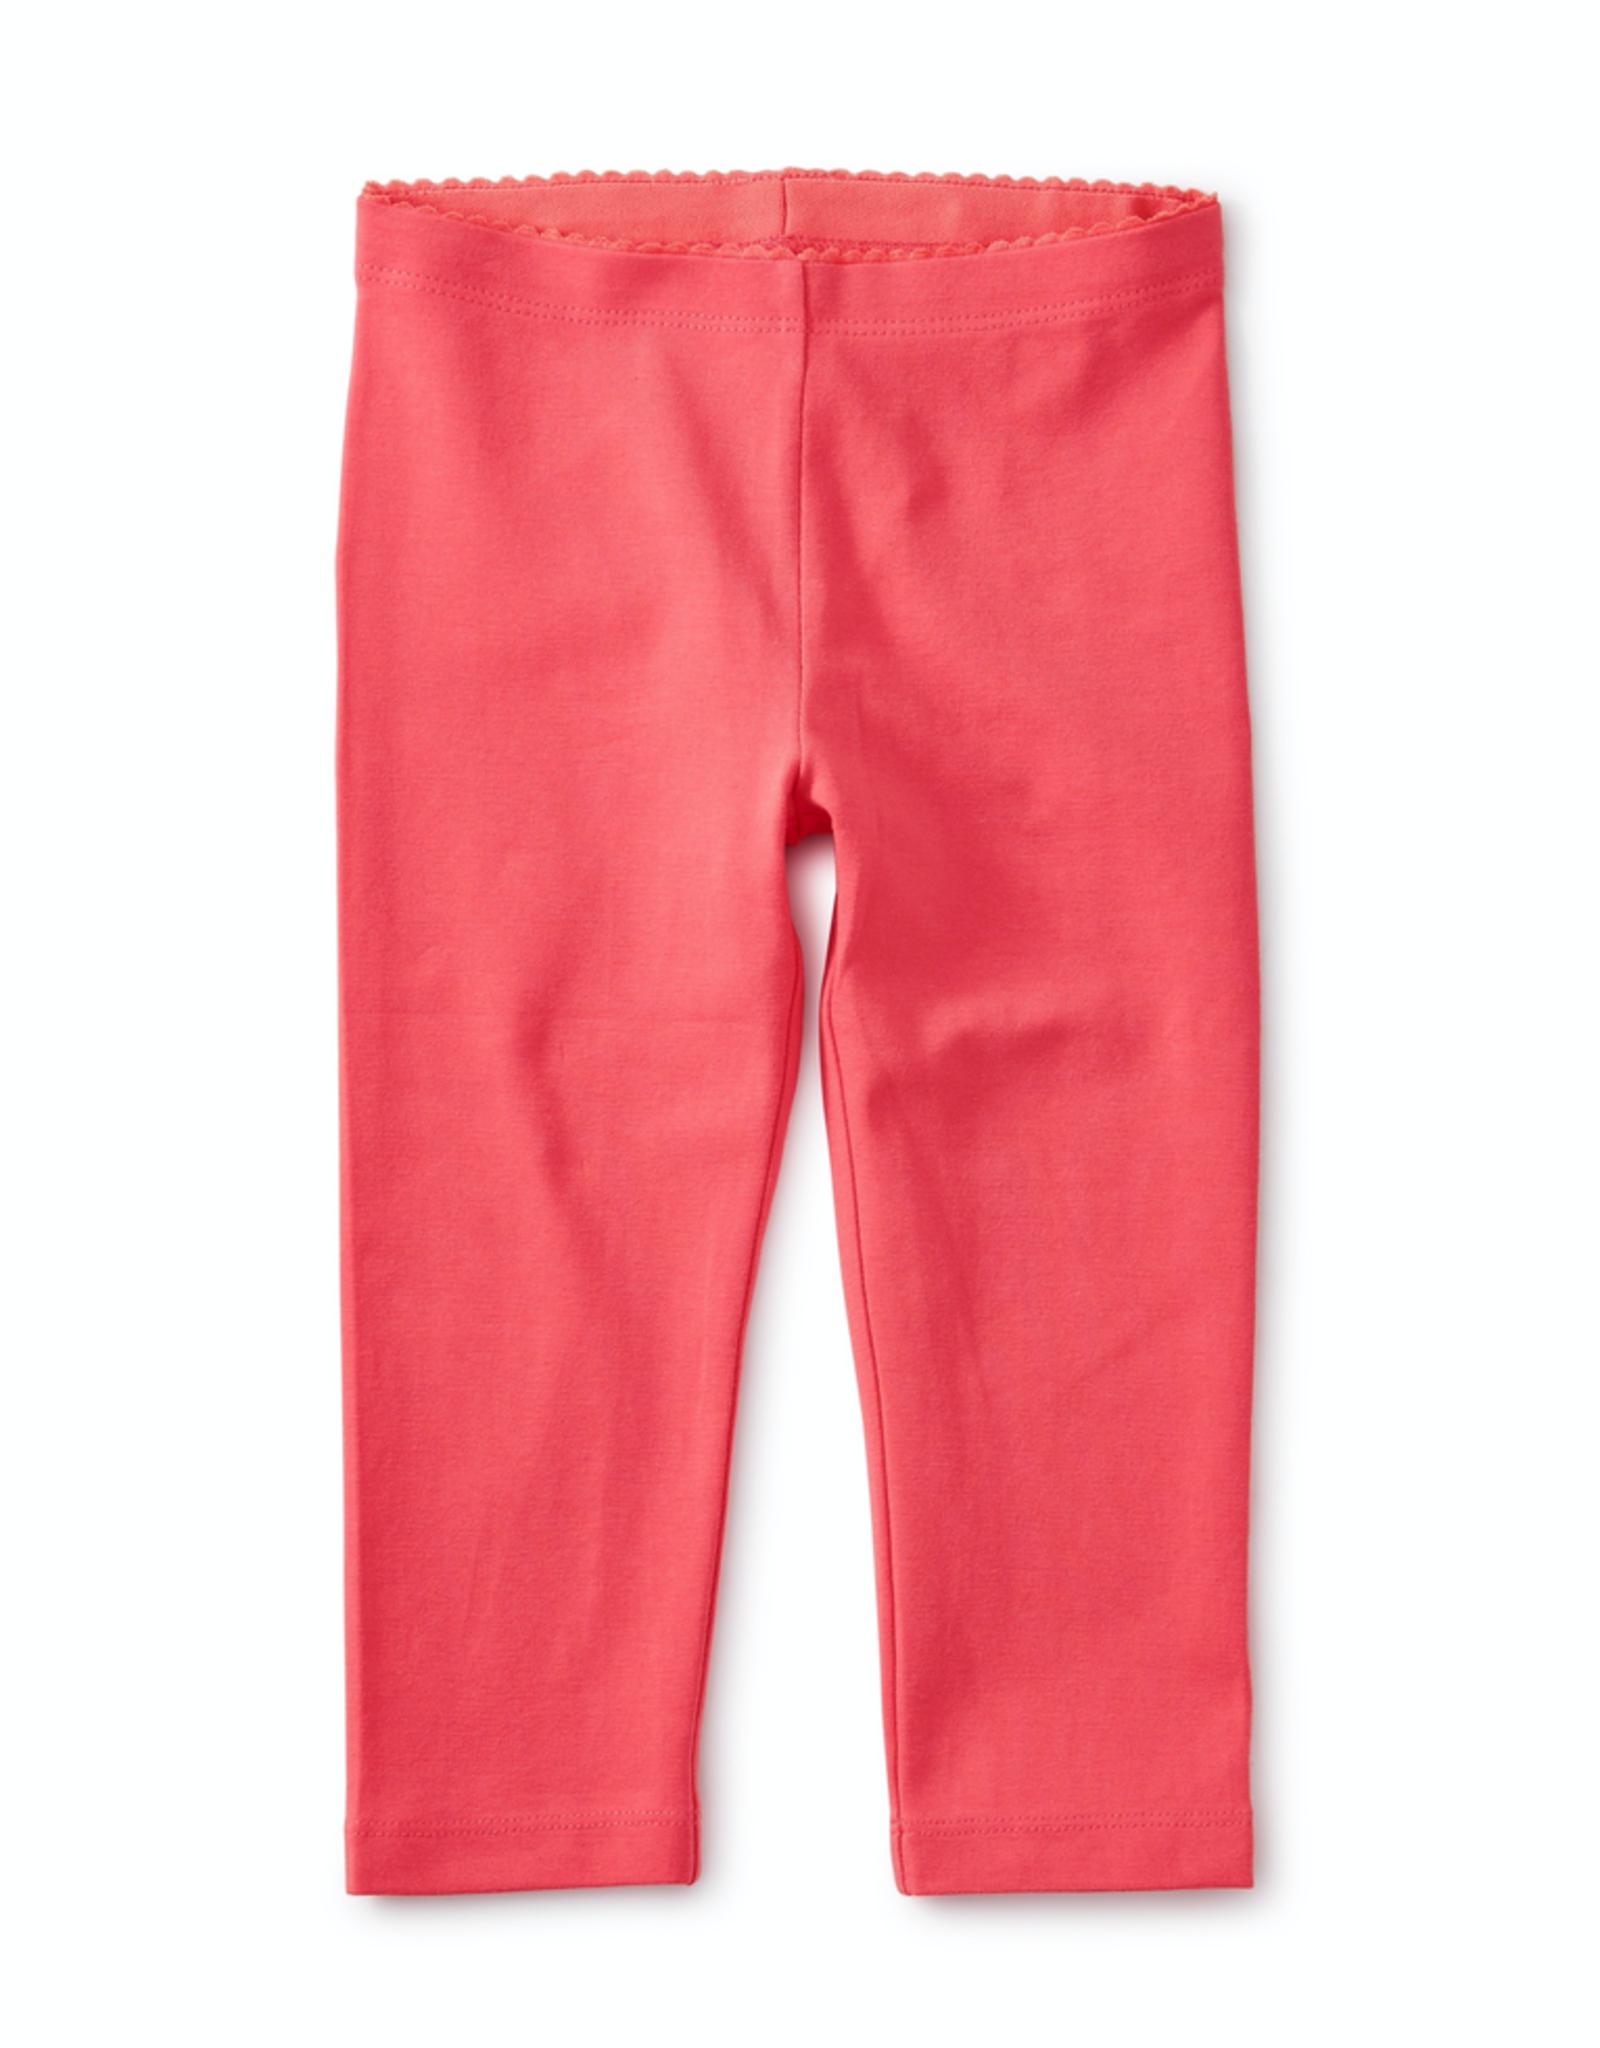 Tea Collection Flat Neon Rosa Solid Capri Leggings